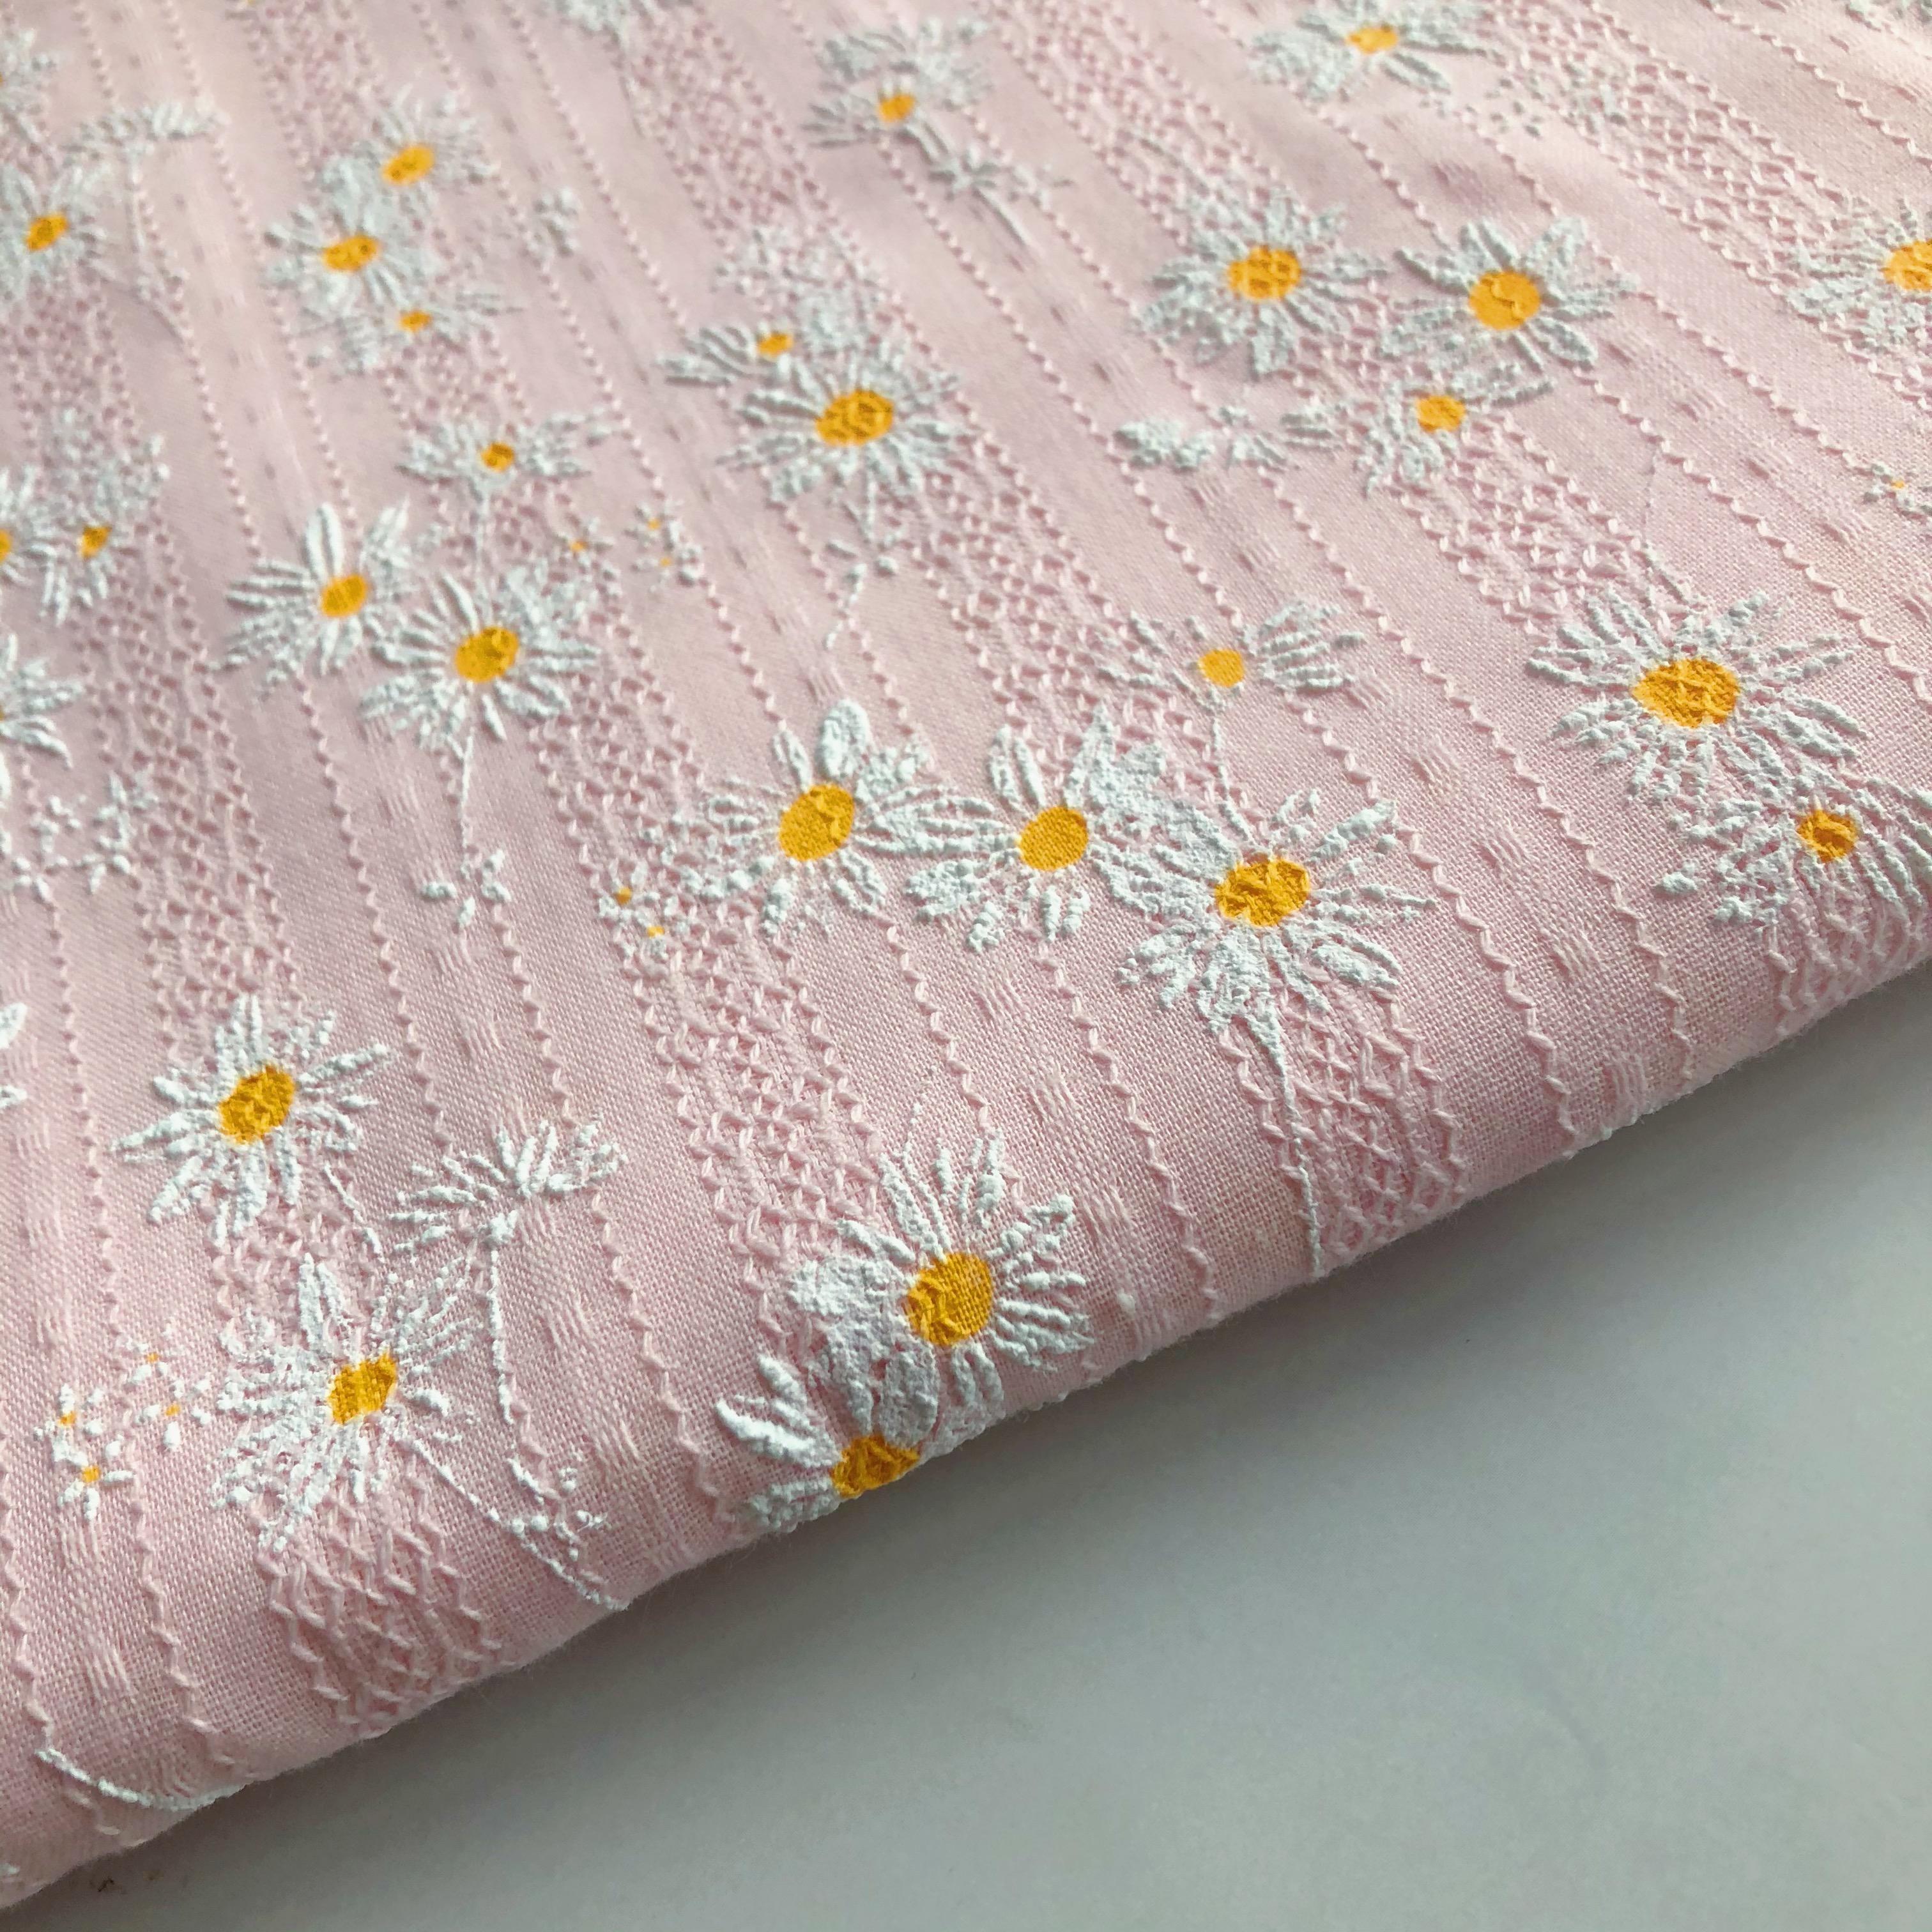 Latest design super soft flower pattern 100% cotton bubble print fabric for dress